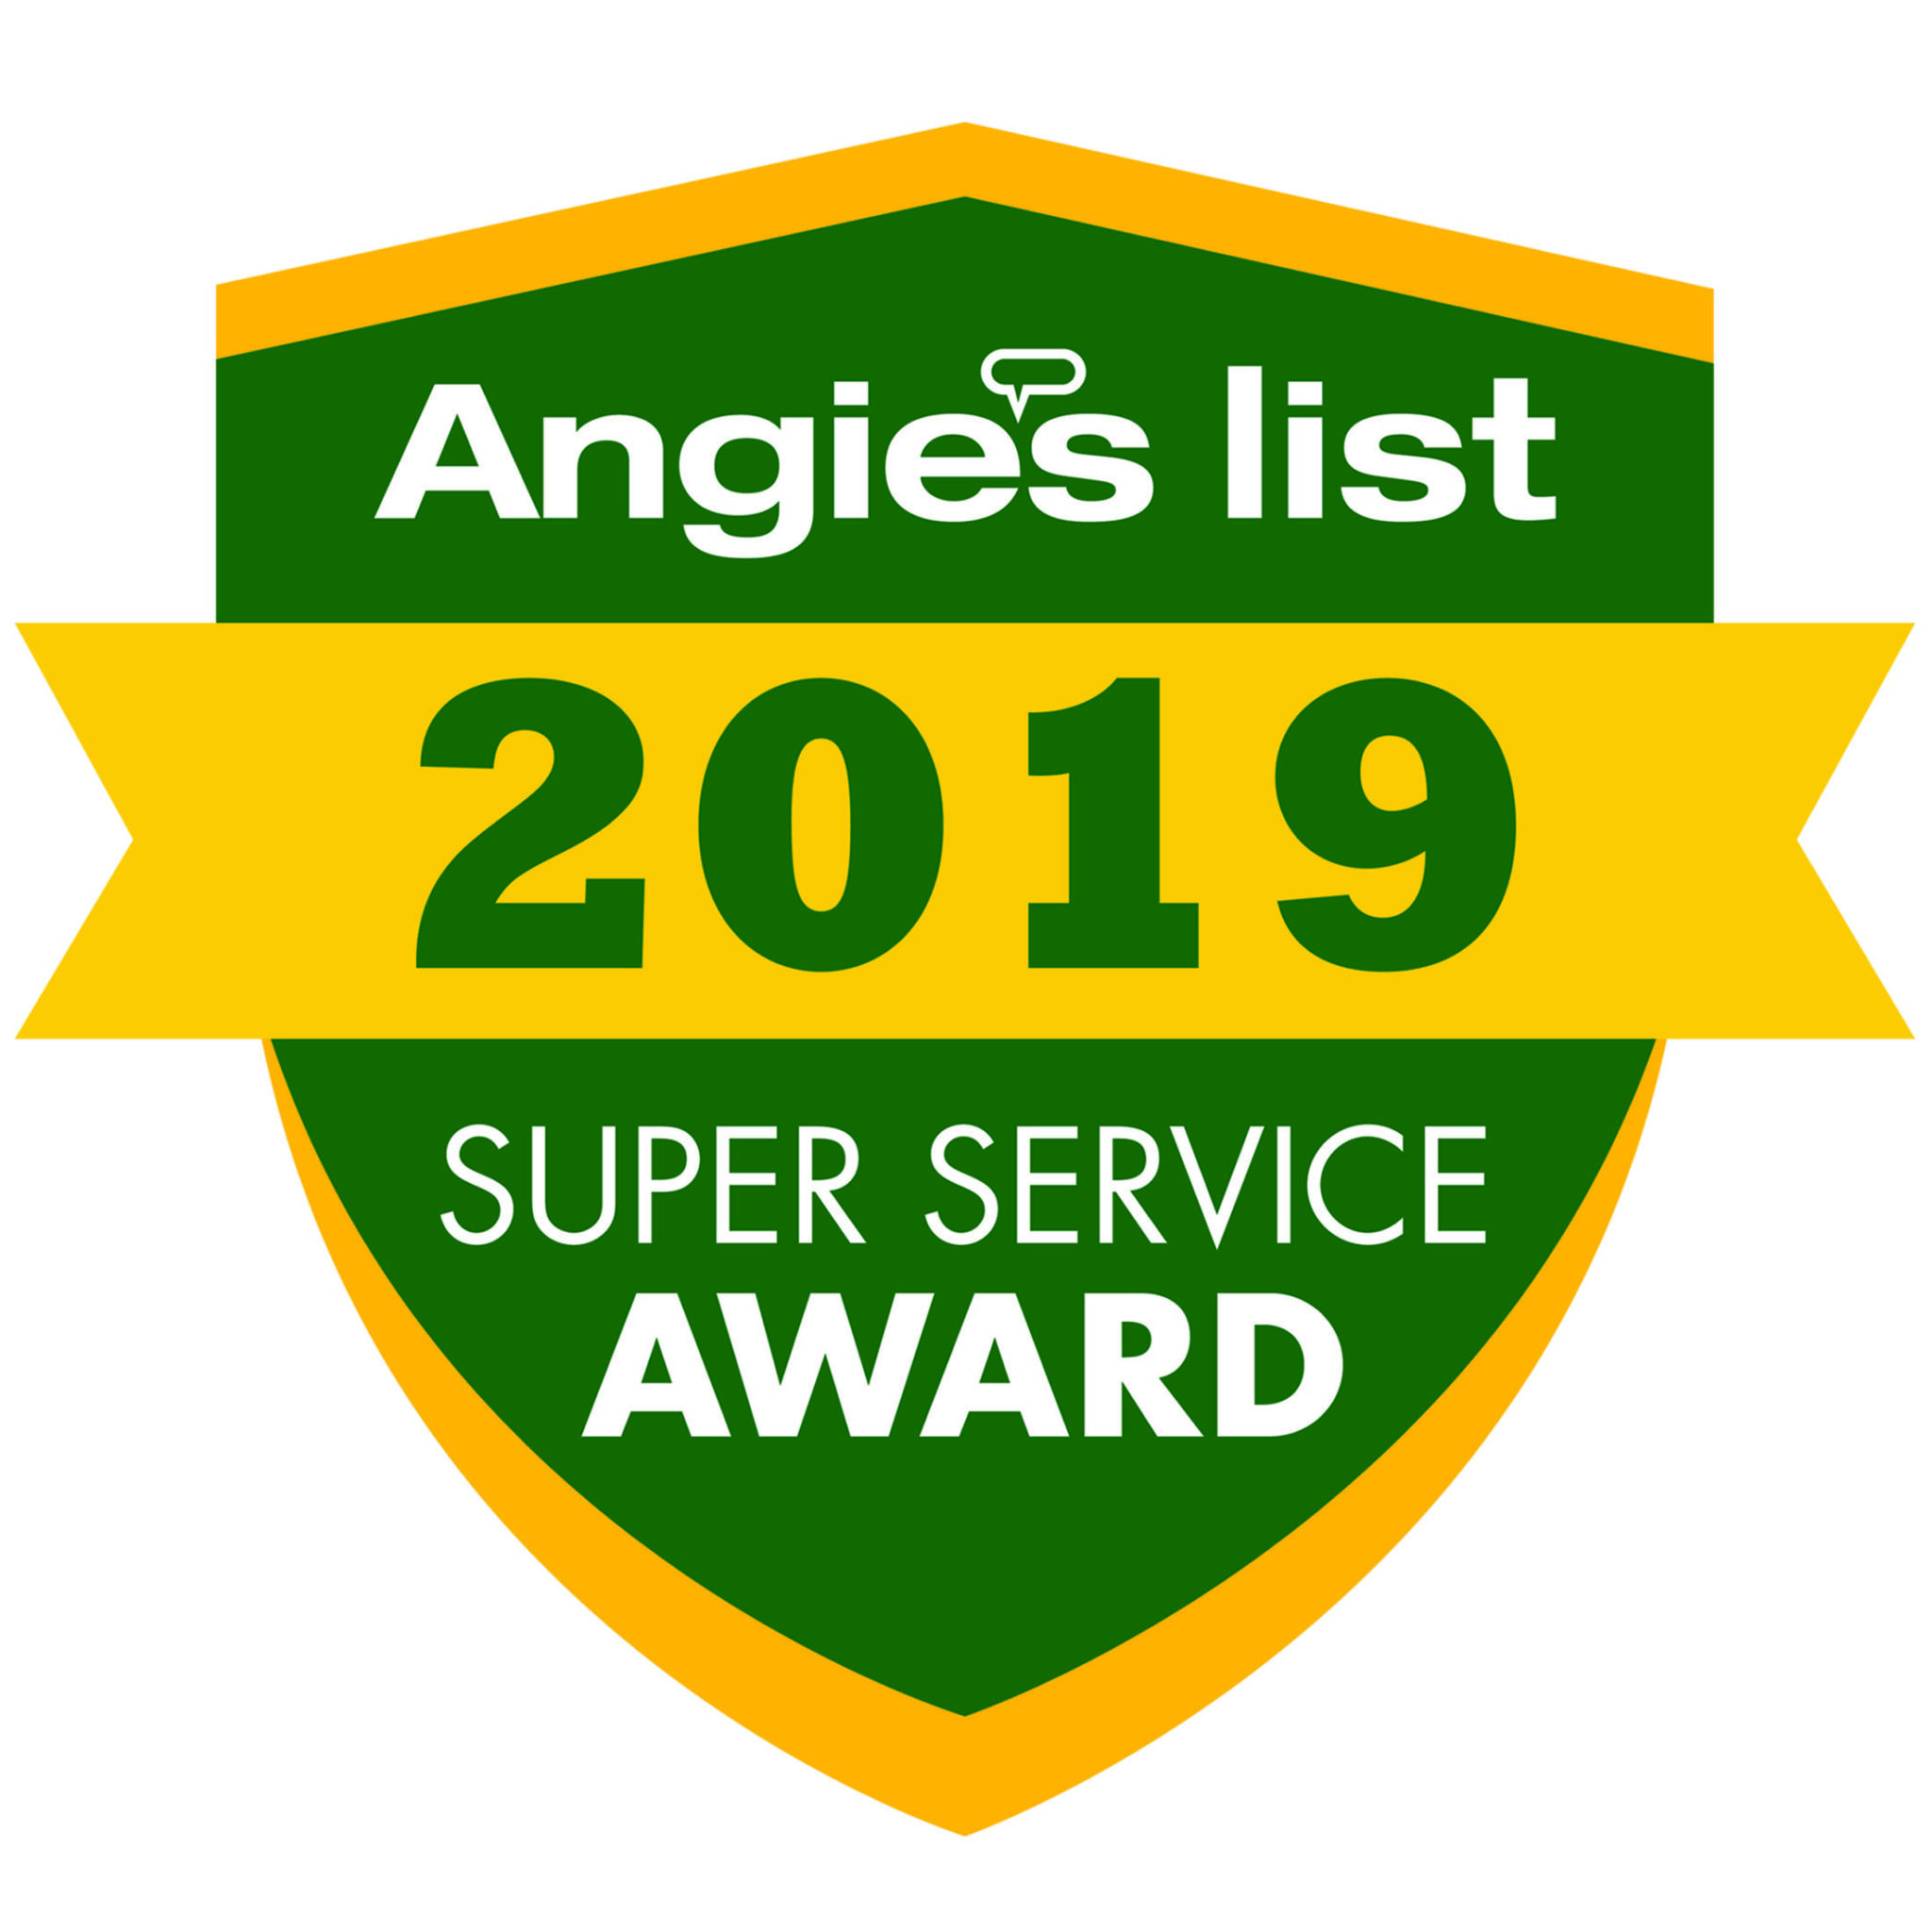 angies-list-super-service-award-2019